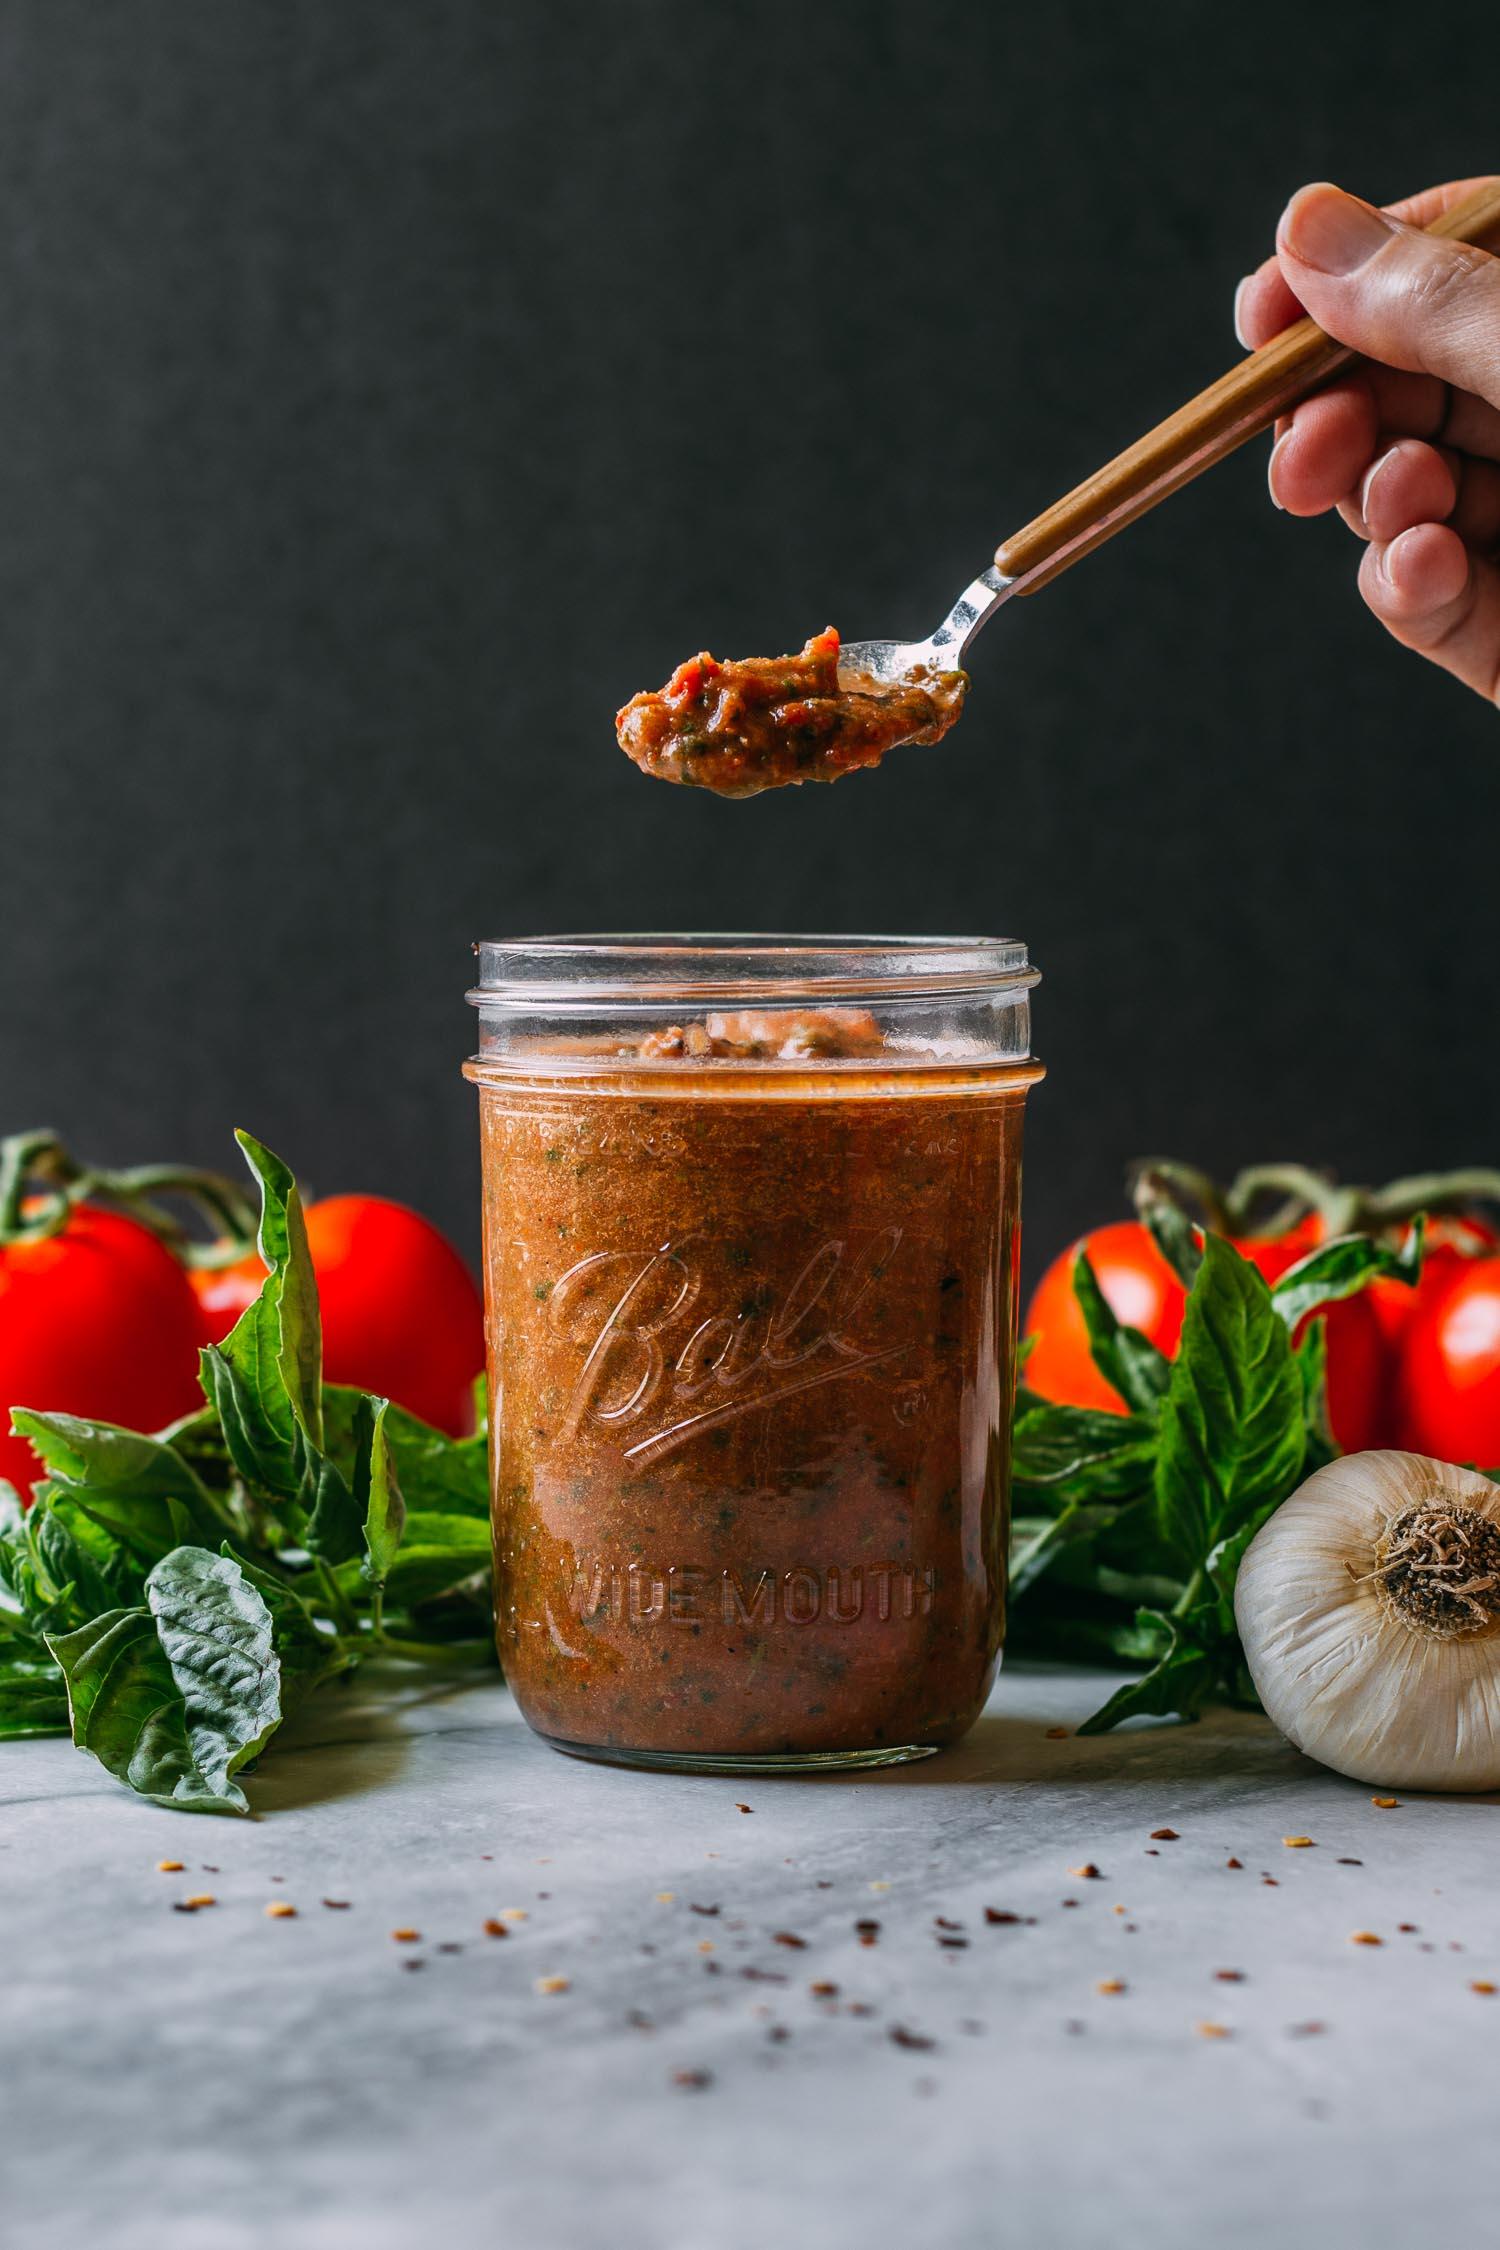 5-Minute Tomato Basil Pesto Sauce #sun-dried #tomato #tomatoes #basil #pesto #sauce #pasta #no-cook #blender #oregano #herbs #vegan #plant-based #simple #recipe #wfpb #recipes #wfpbno #gluten-free #Italian #5-minutes #garlic #healthy #fit